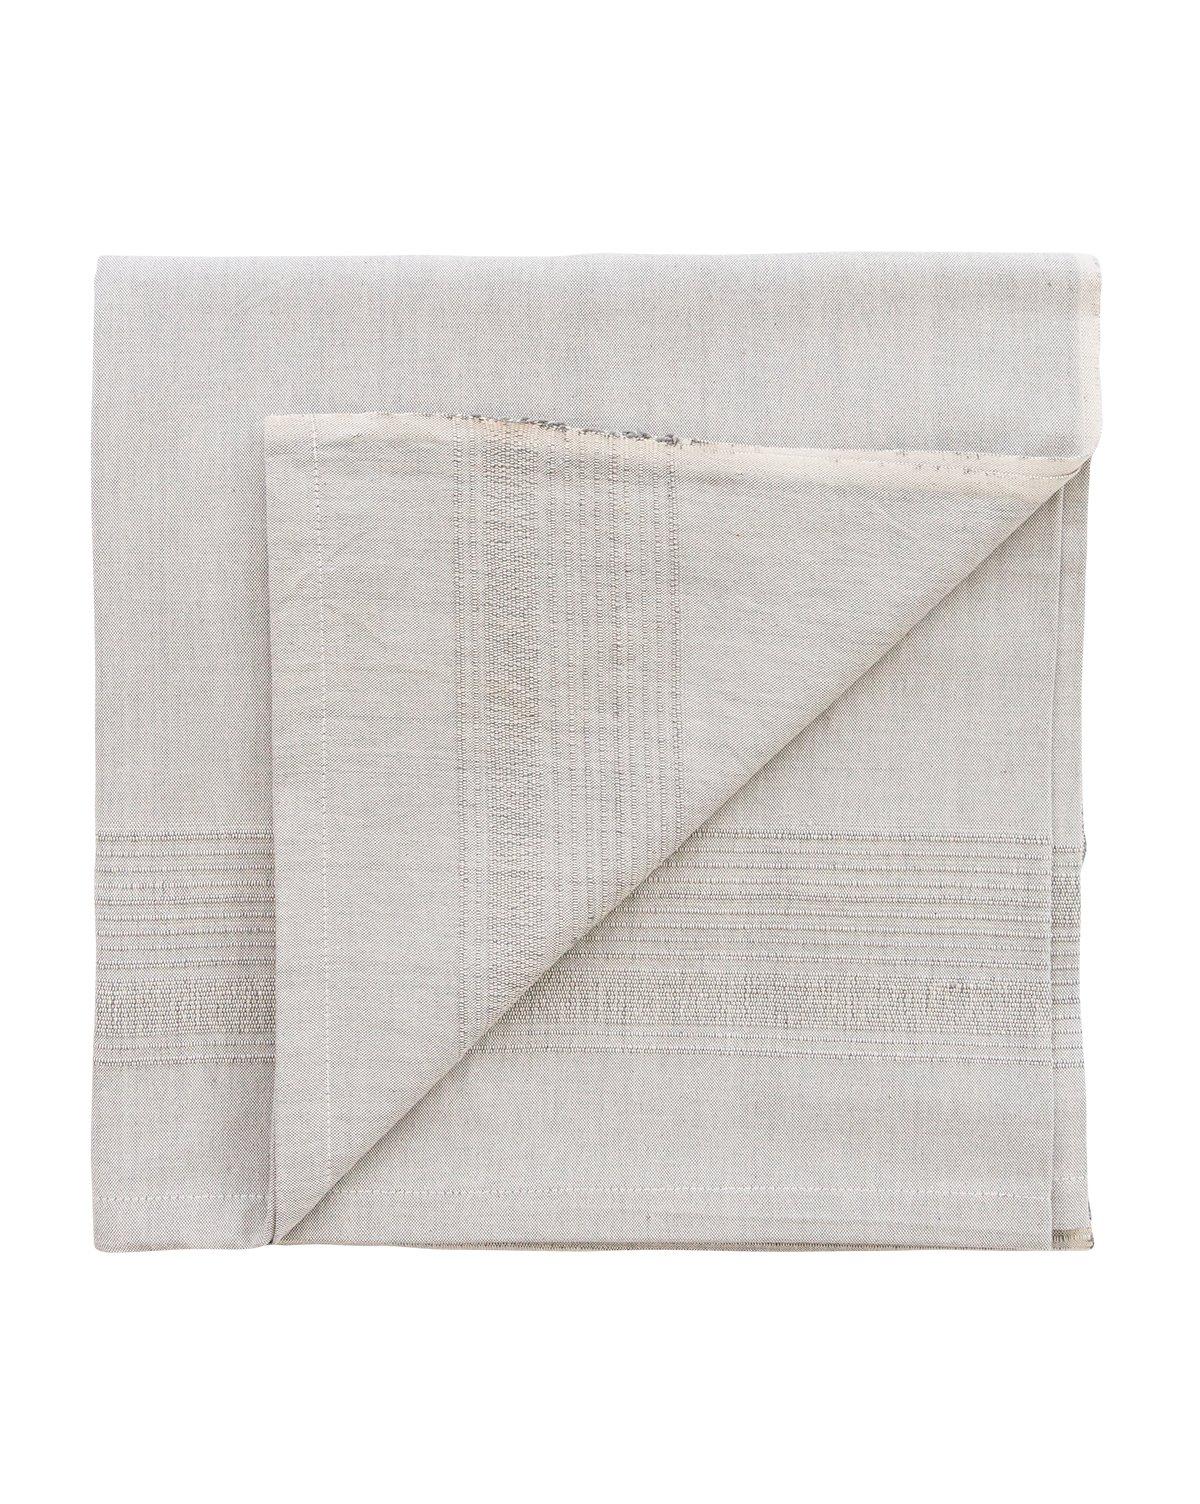 fringed_edge_tablecloth2.jpg